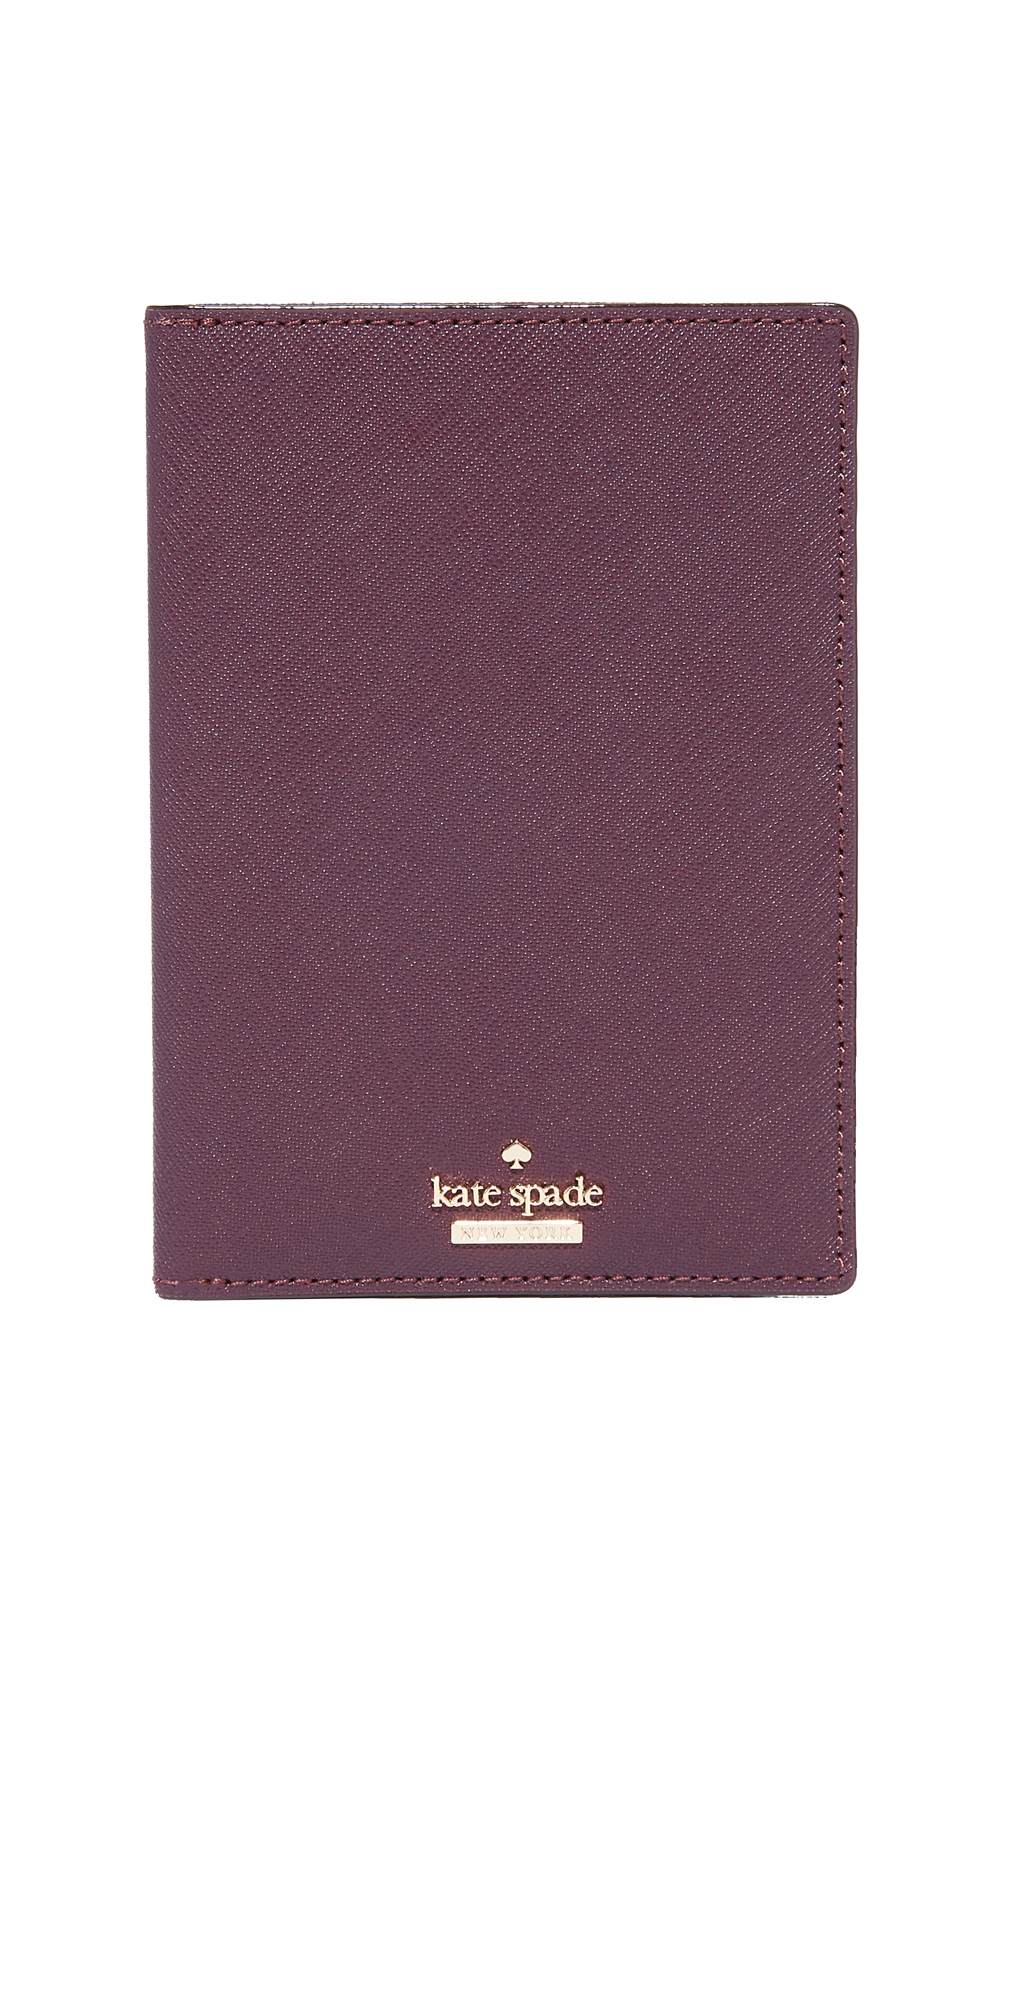 Travel Passport Holder Kate Spade New York